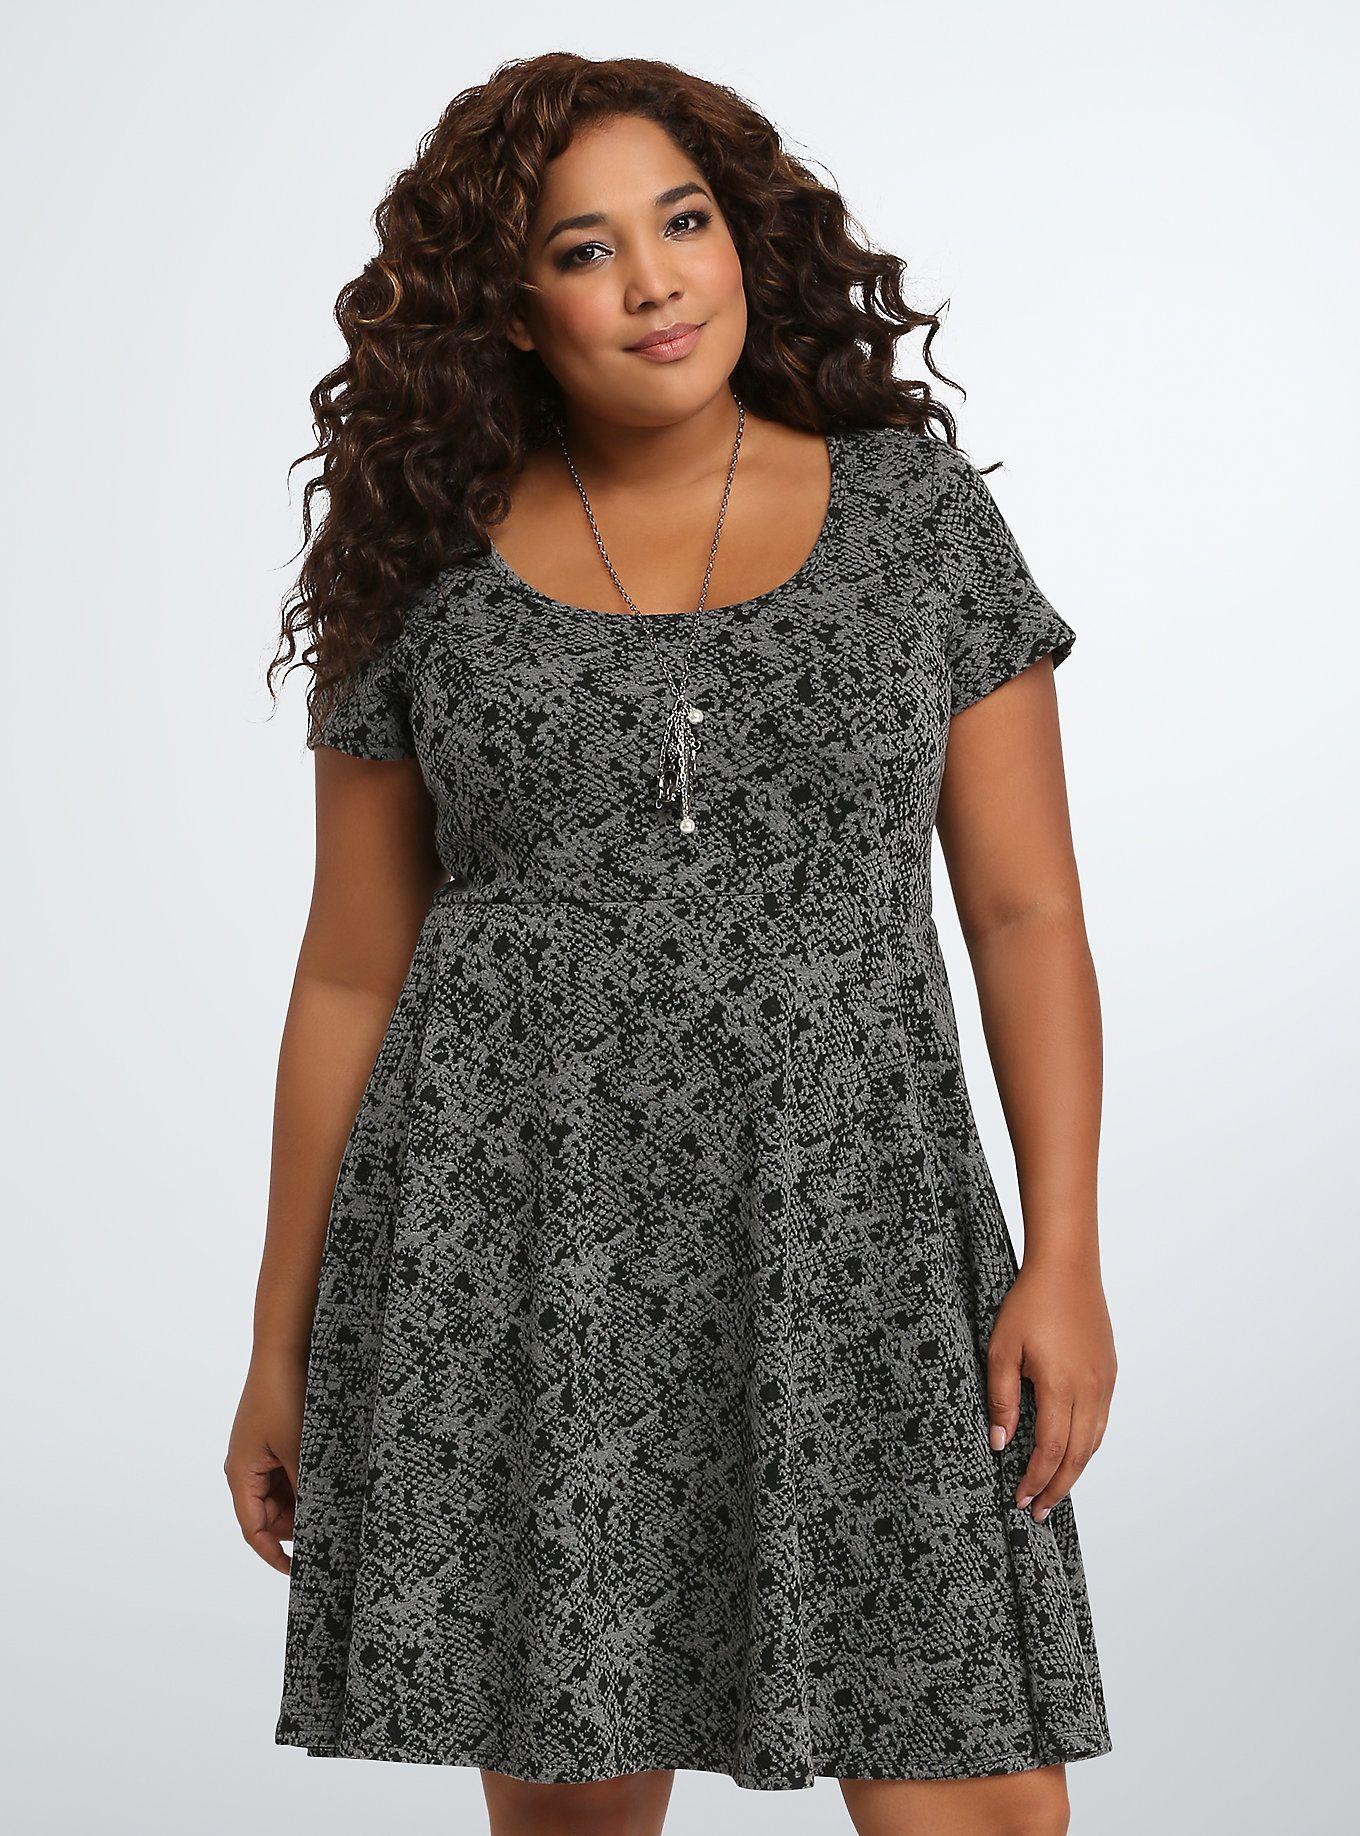 58cb1df3b77e9 Textured Double Knit Skater Dress